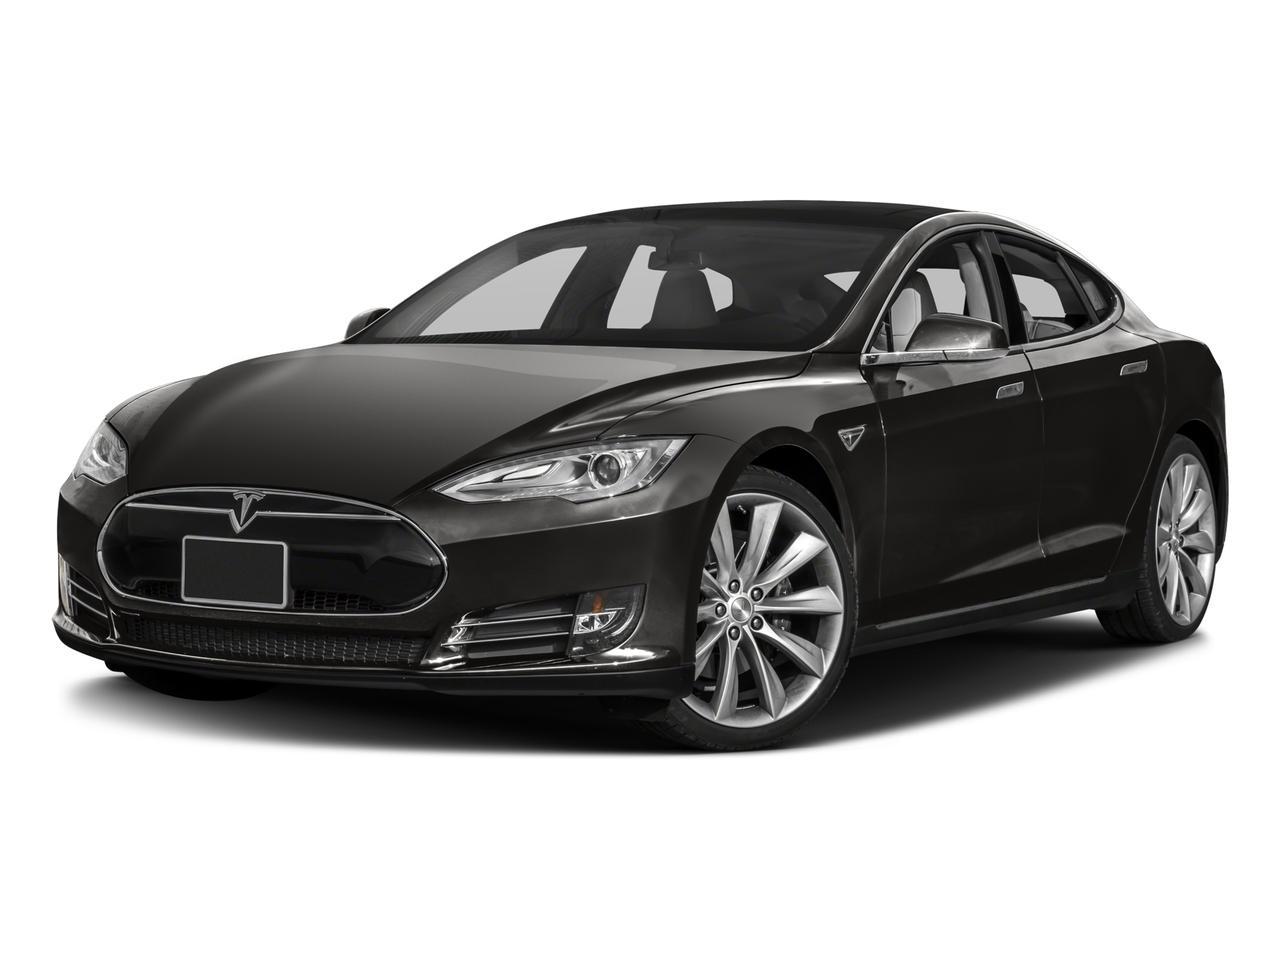 2016 Tesla Model S Vehicle Photo in Colorado Springs, CO 80905